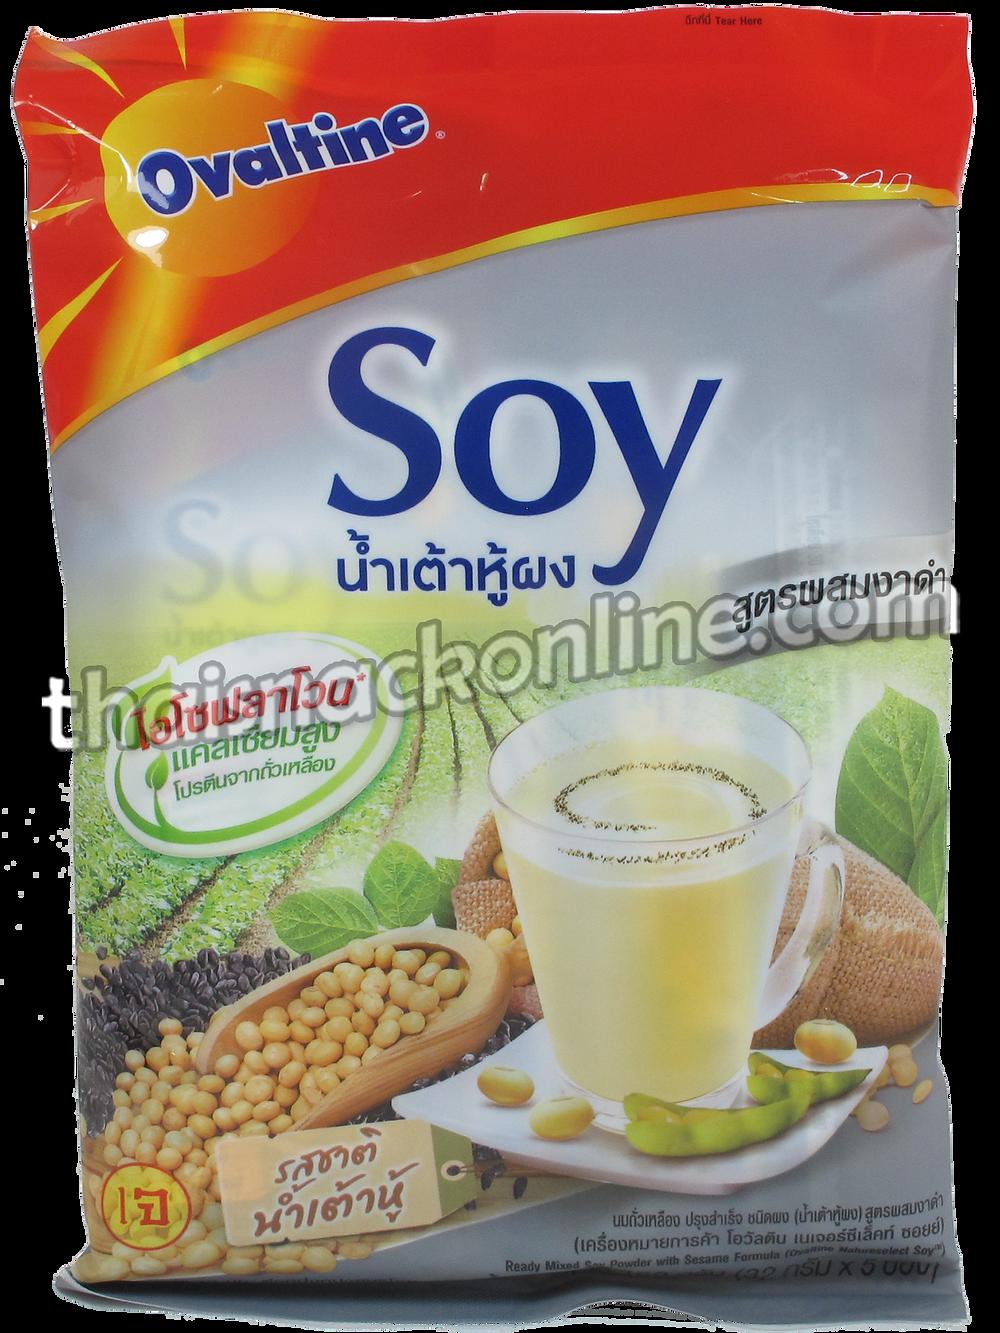 Ovaltine - Soy Powder with Black Sesame (160g)